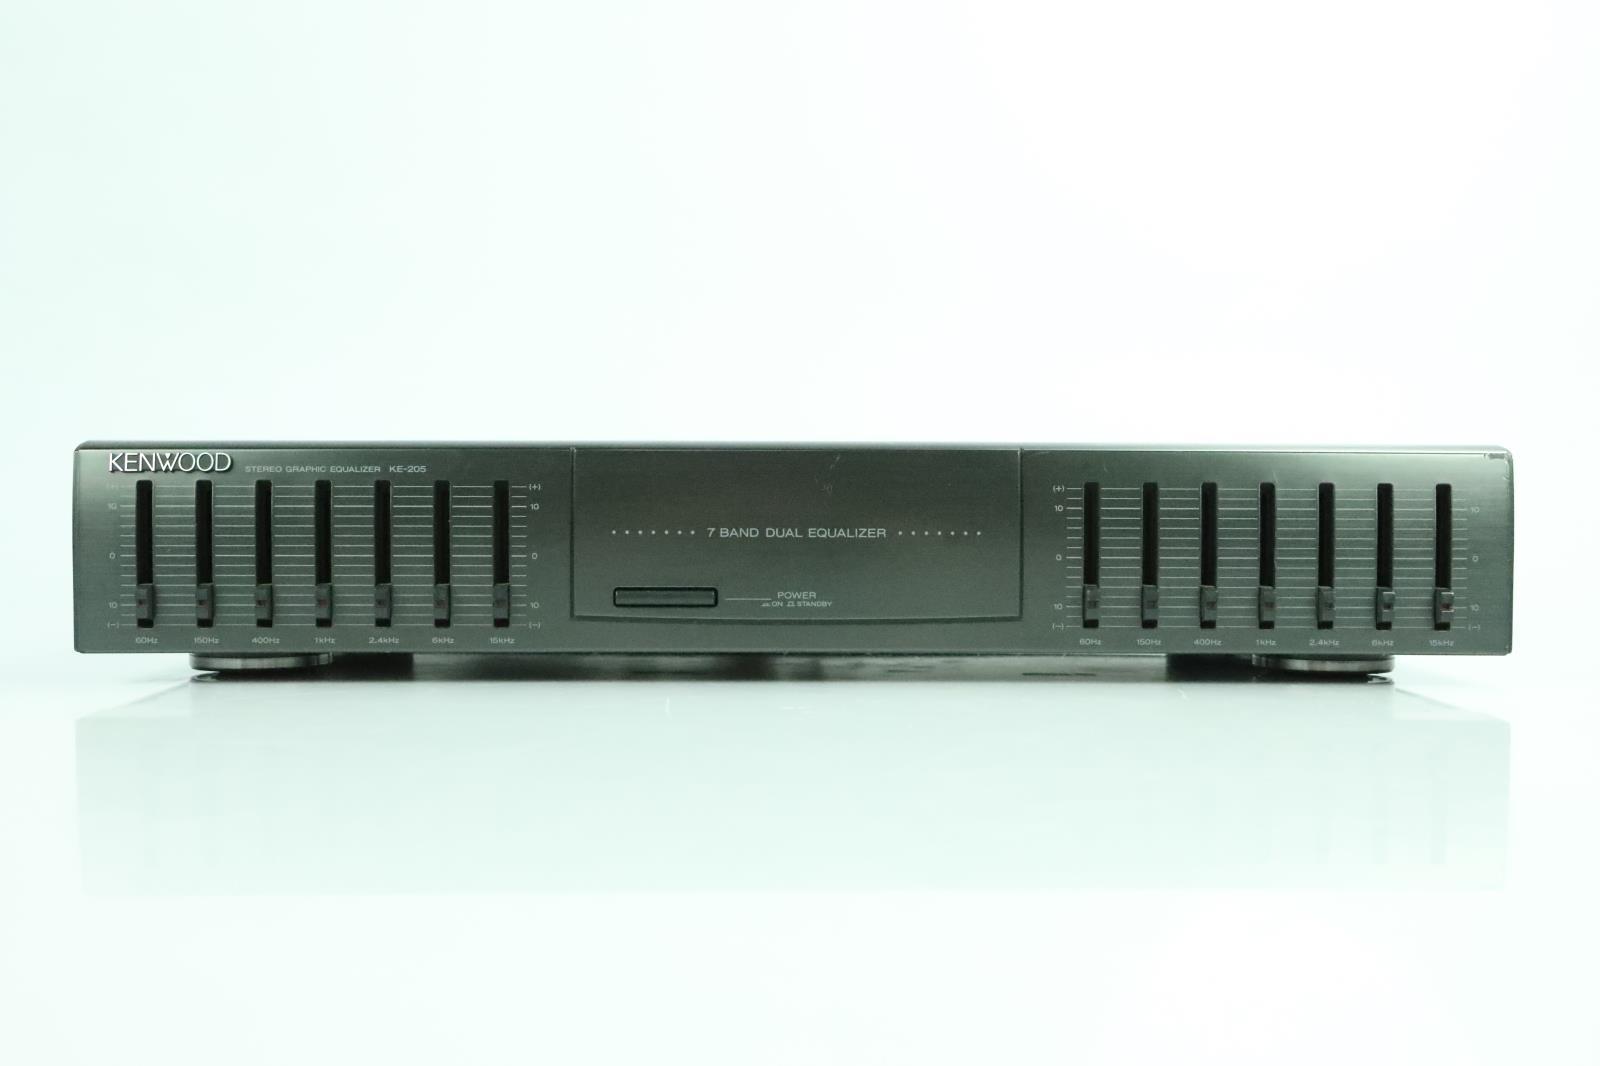 Kenwood KE-205 Stereo Graphic EQ 7-Band Dual Equalizer KE205 #34066